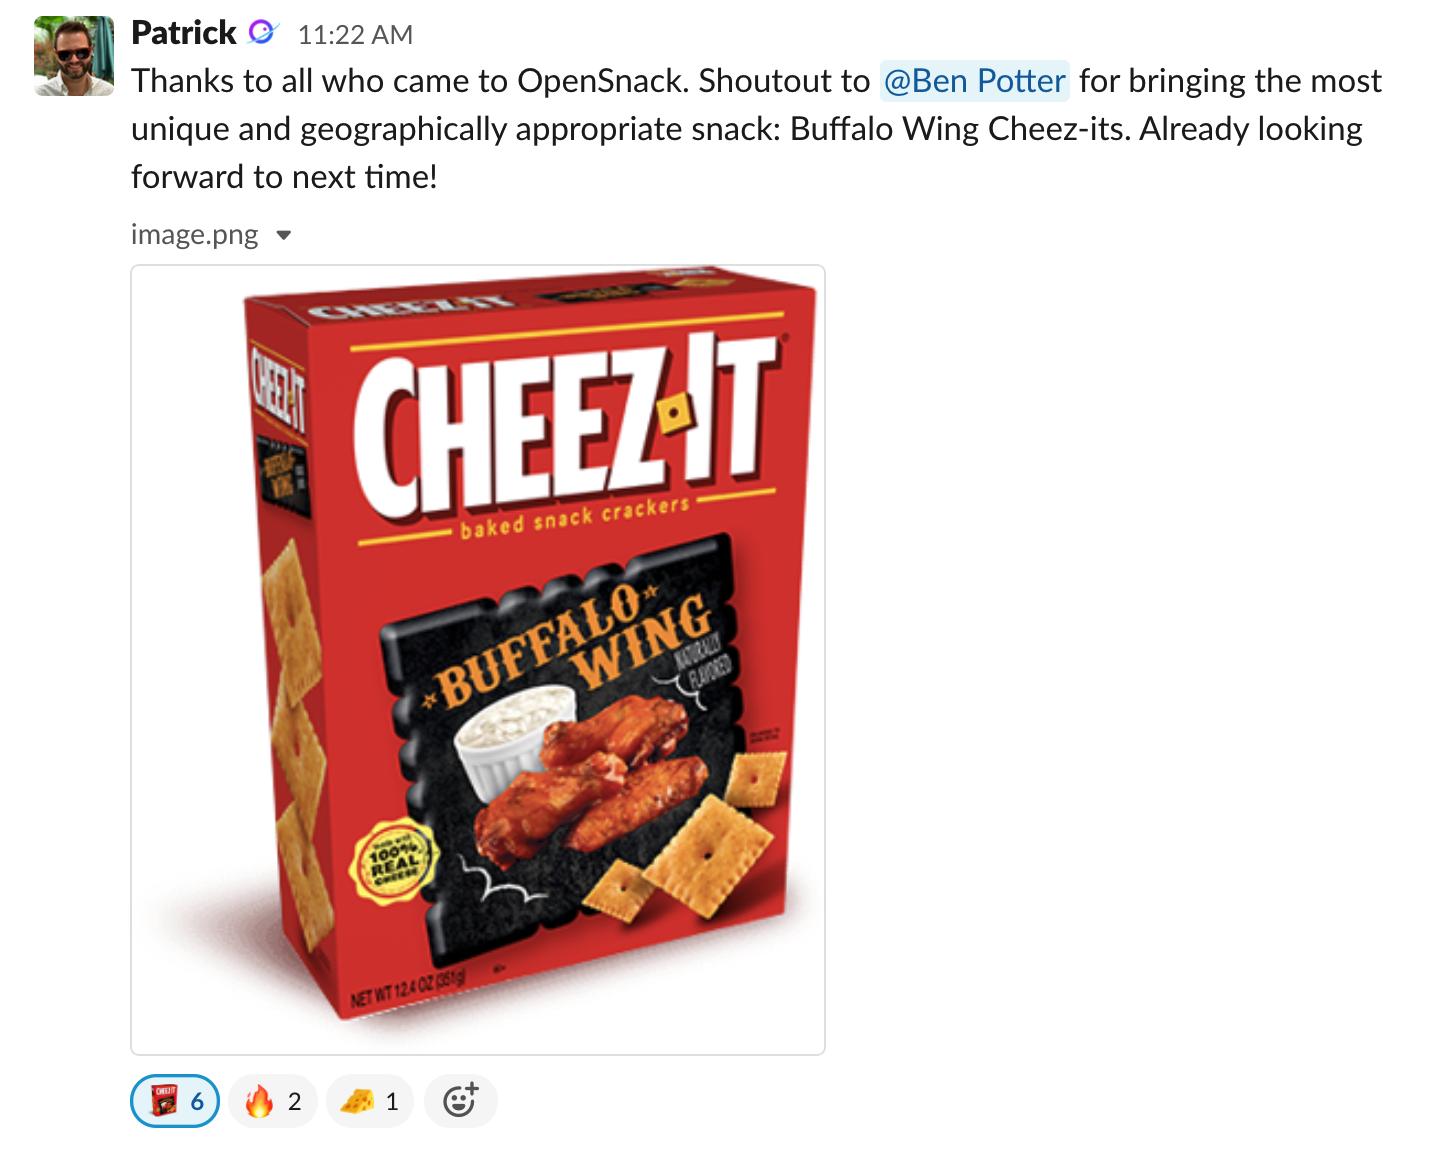 Image of a Cheez-it box